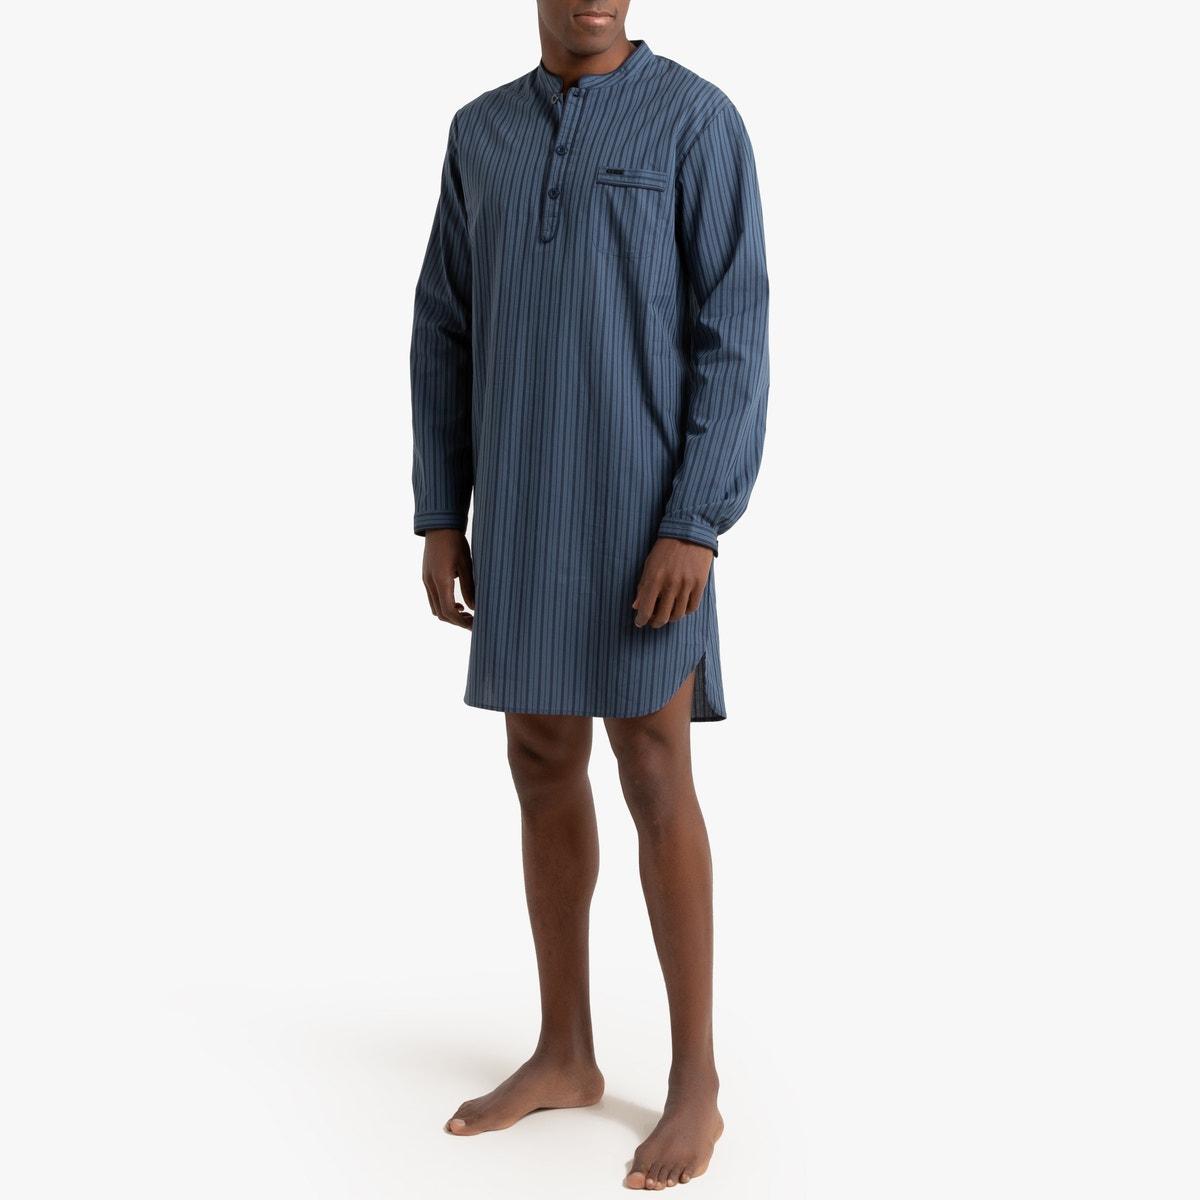 La Redoute Collections - Ριγέ πυτζάμα πουκαμίσα 350087463 - 7875